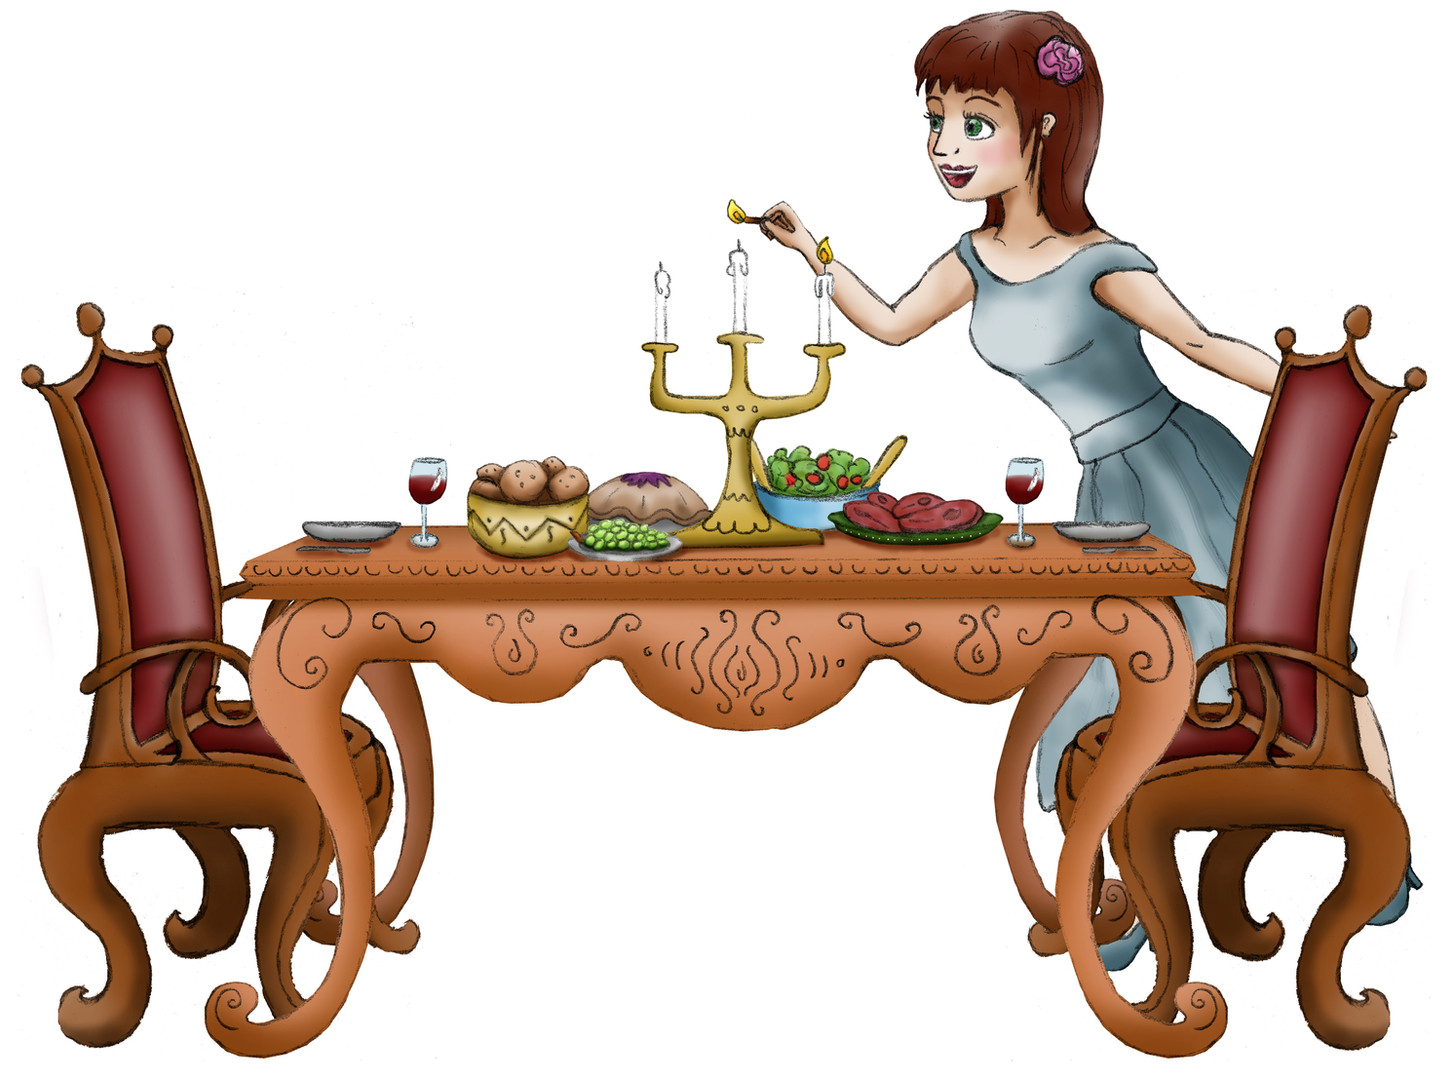 Illustratie 'Assepoester' dekt tafel